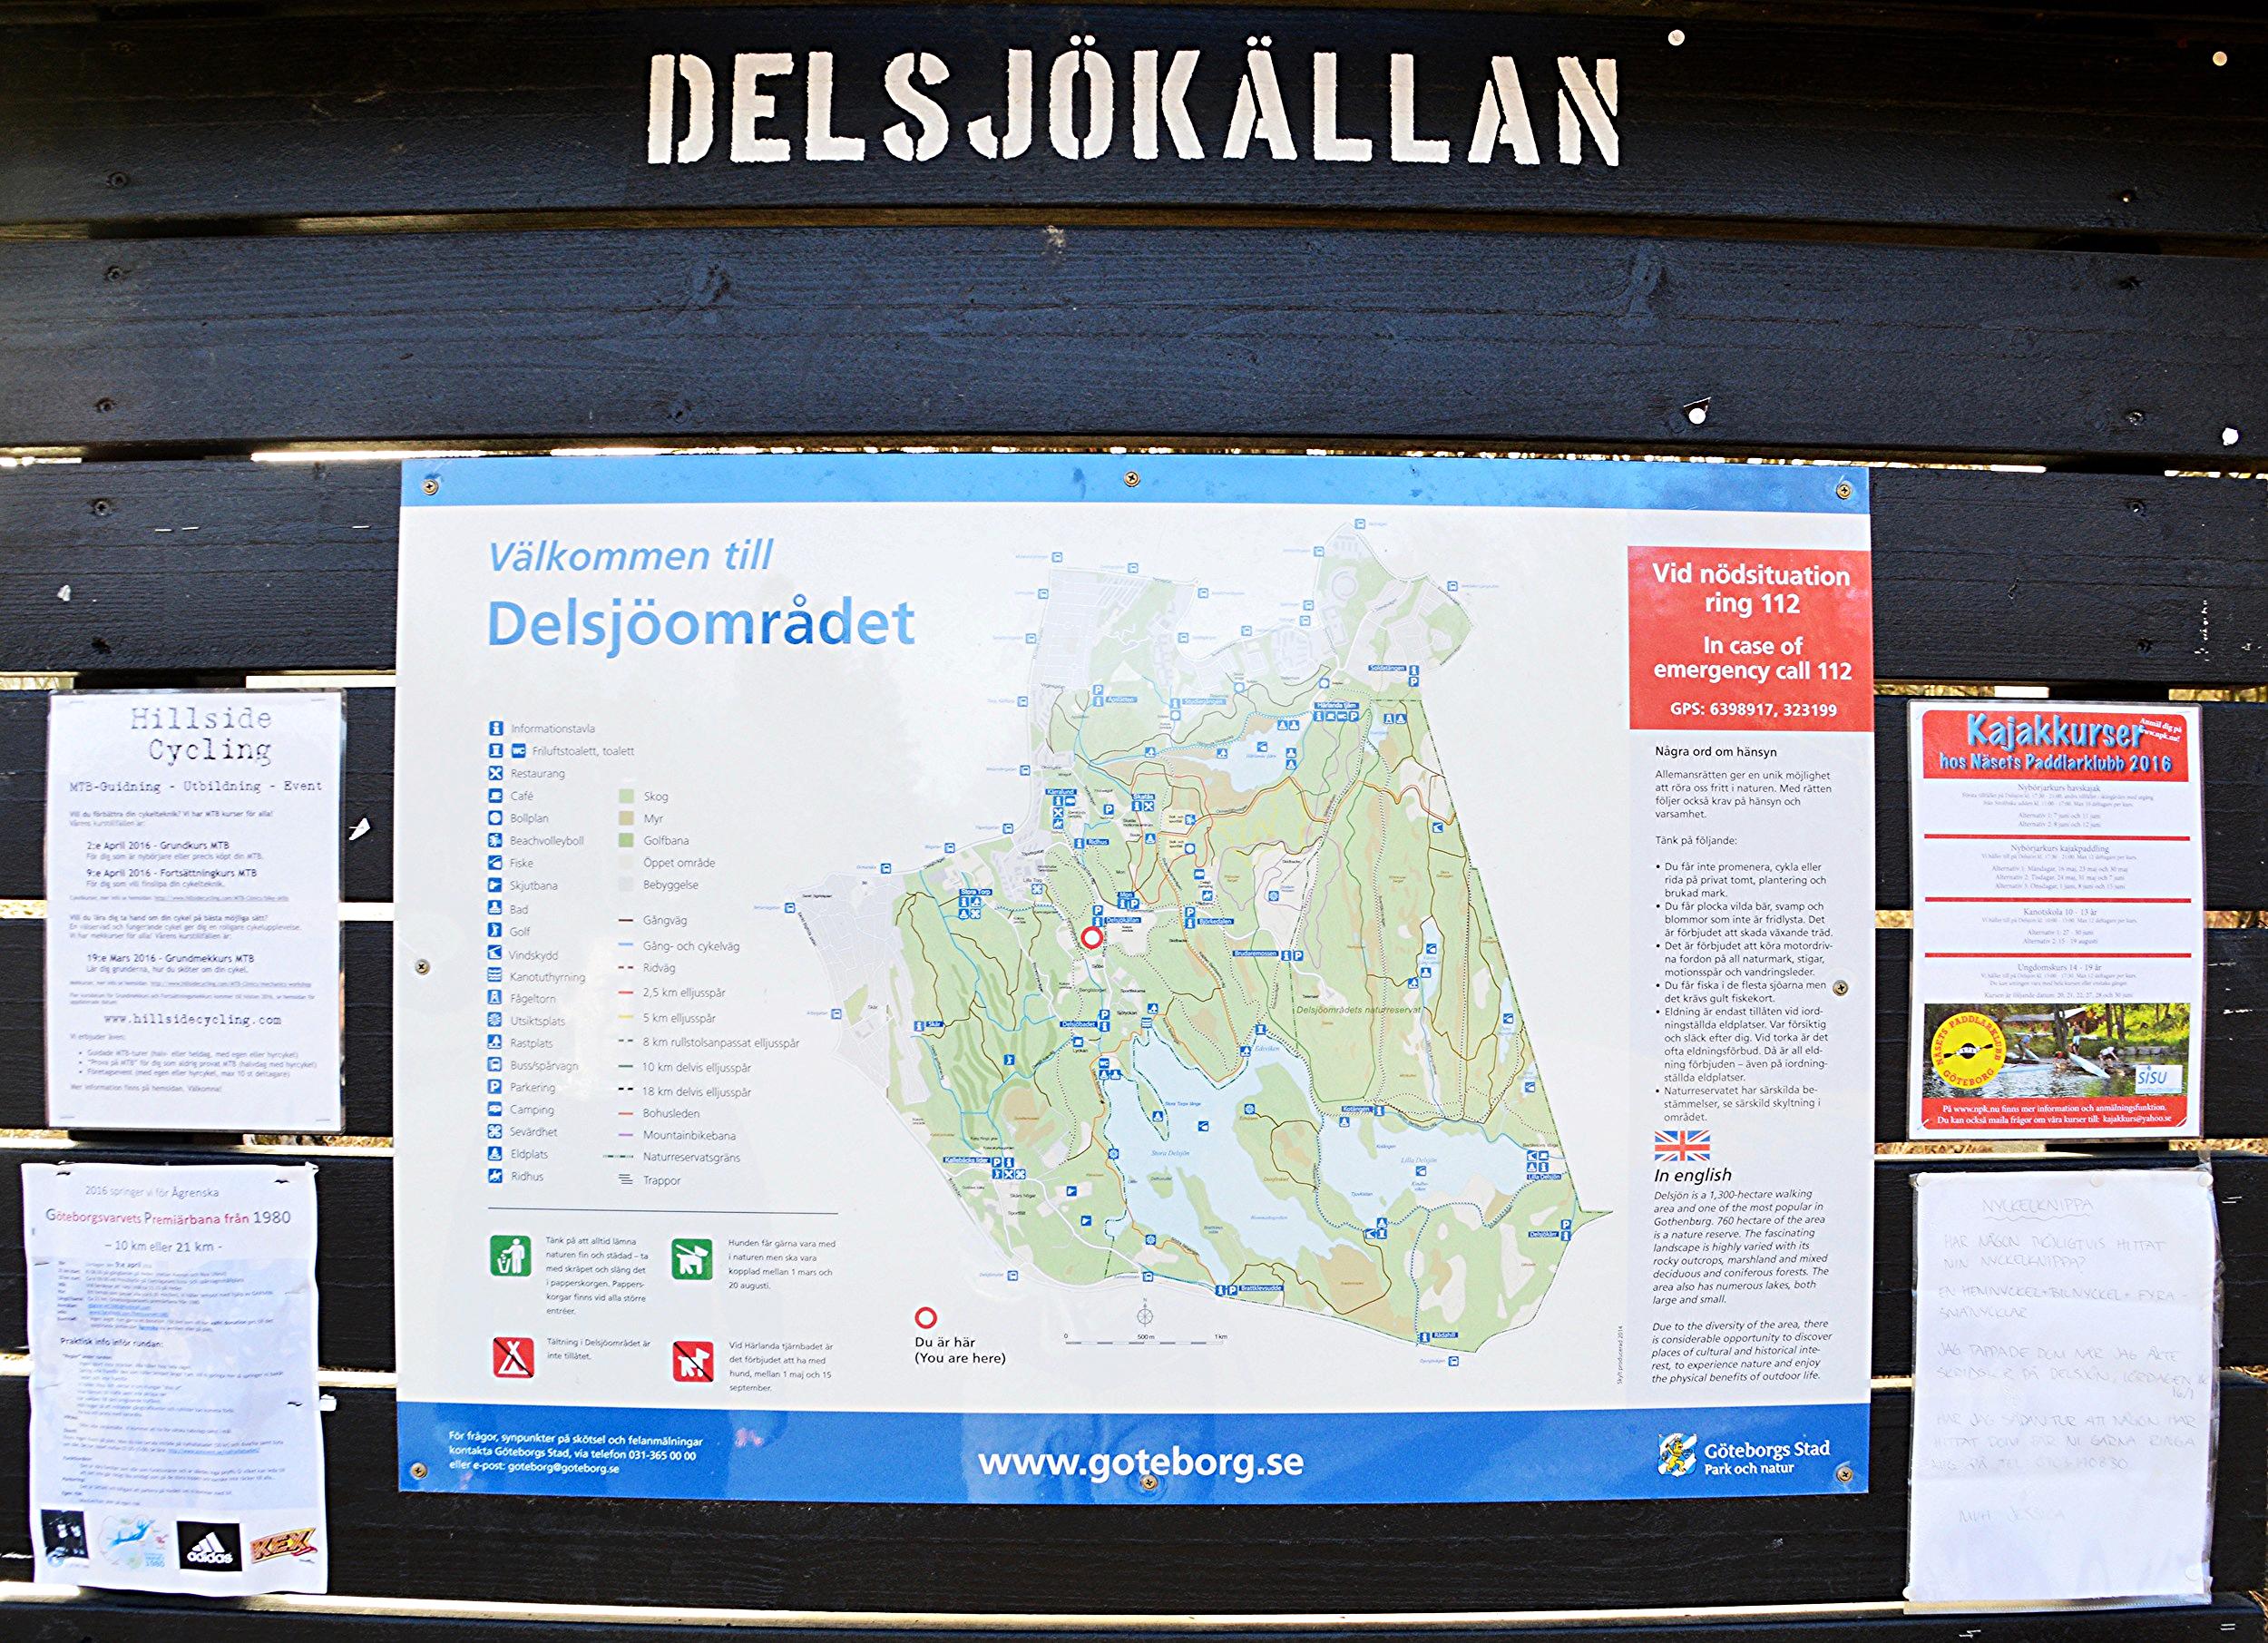 Budget travel in Sweden. Hiking in Sweden.